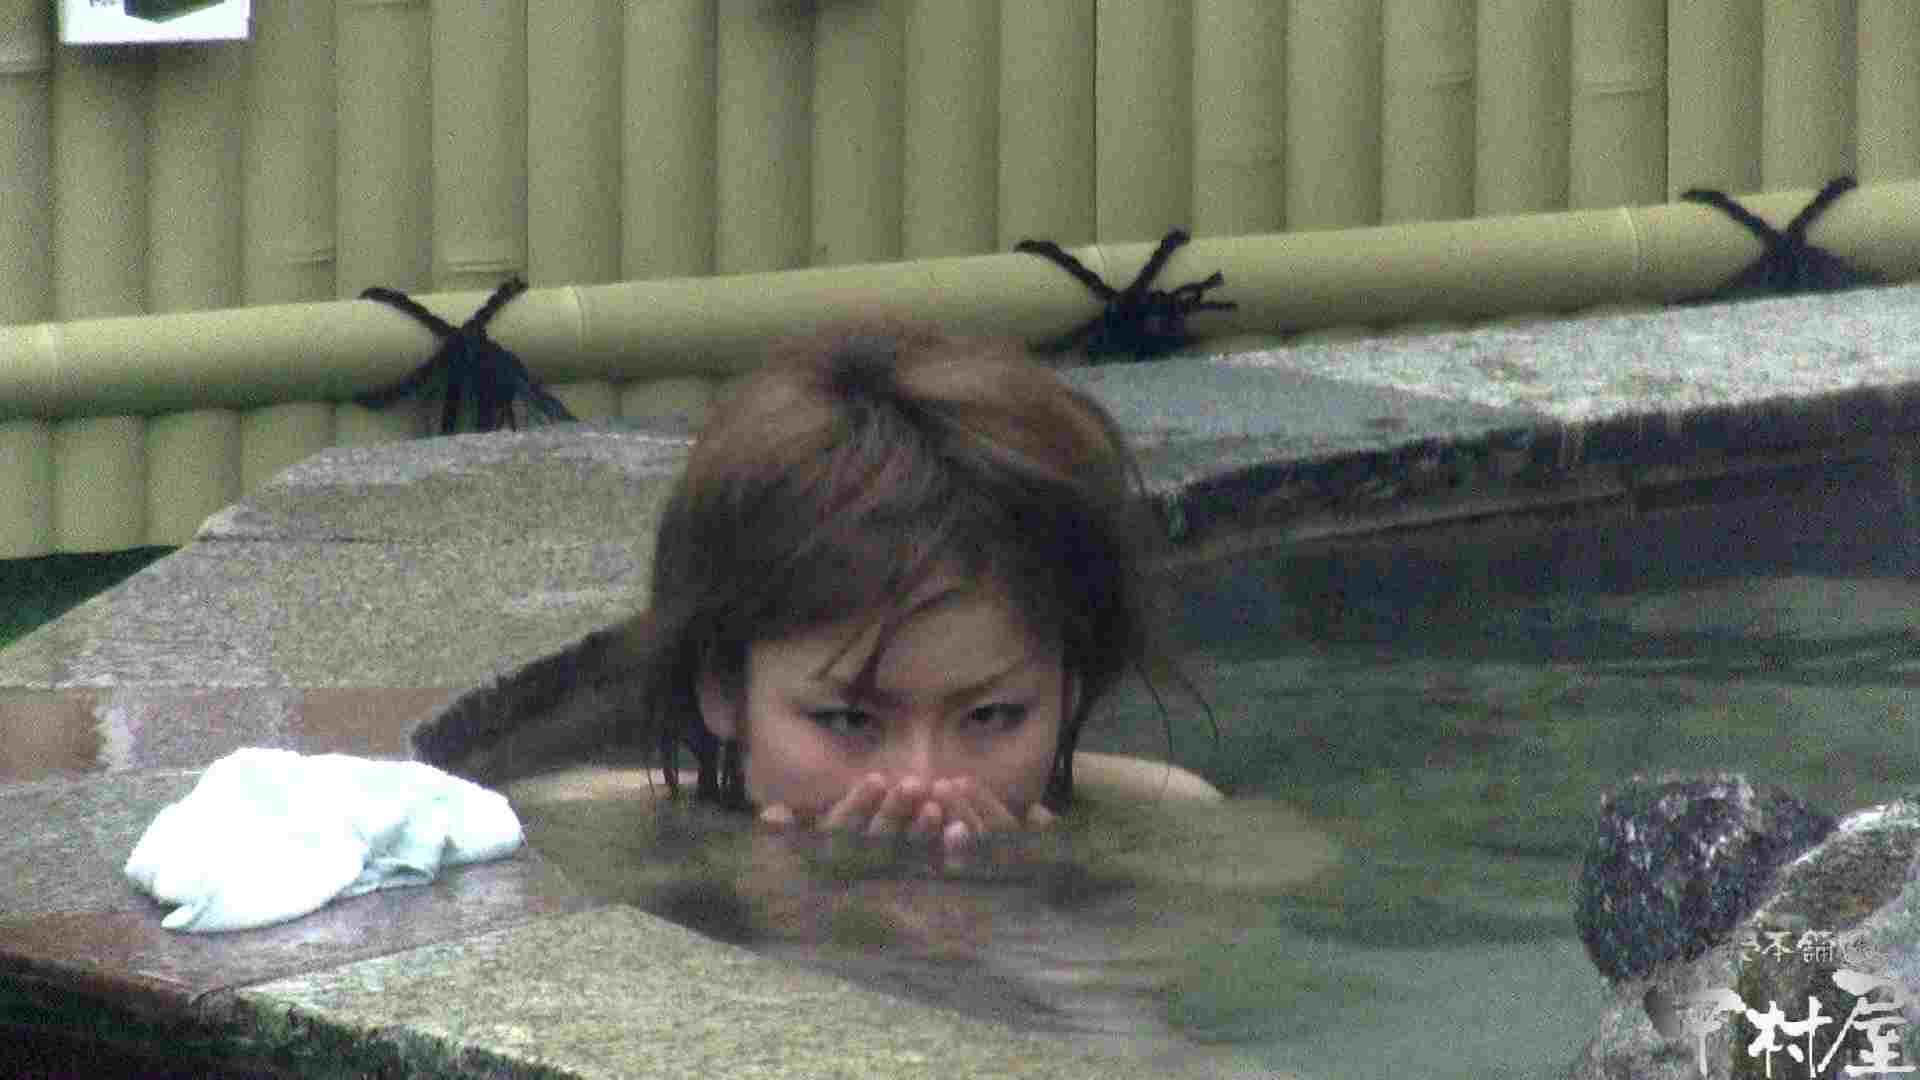 Aquaな露天風呂Vol.918 露天風呂突入 おまんこ無修正動画無料 75pic 56